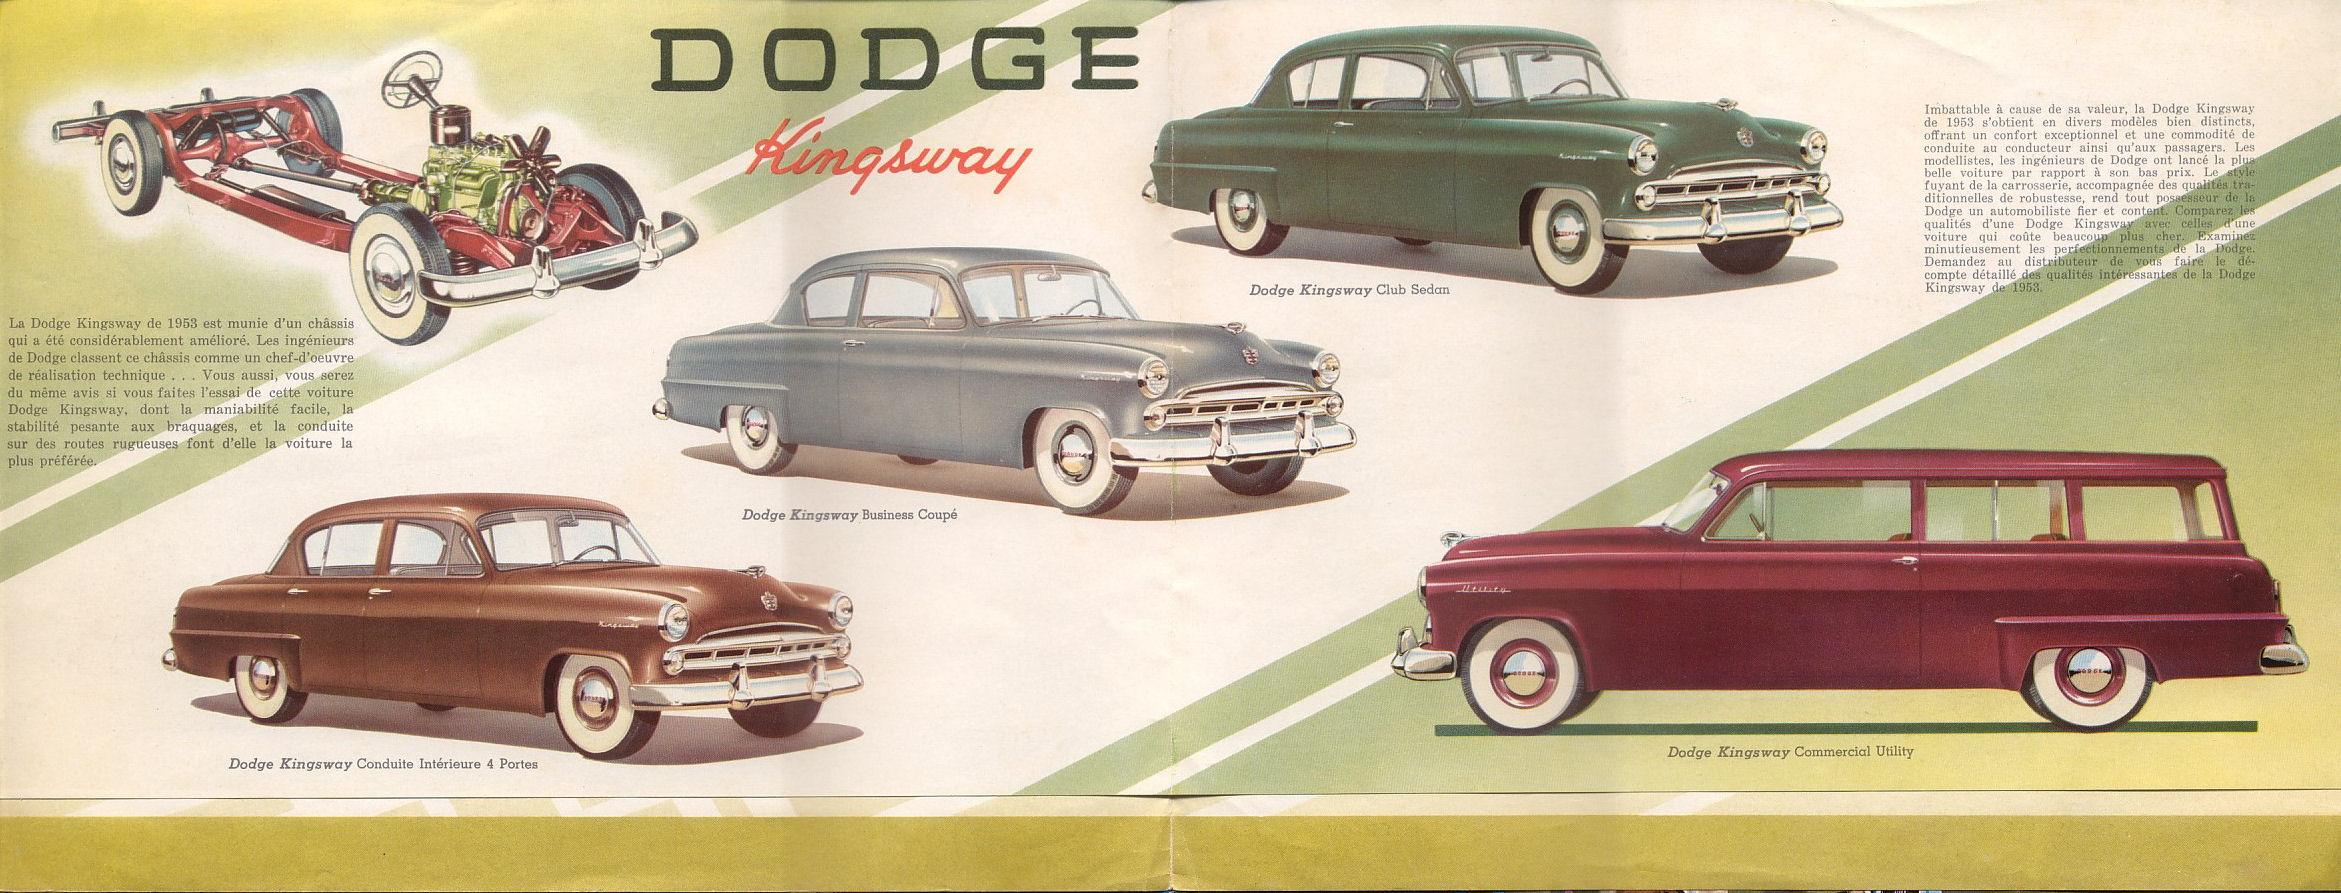 1953 Dodge Kingsway brochure